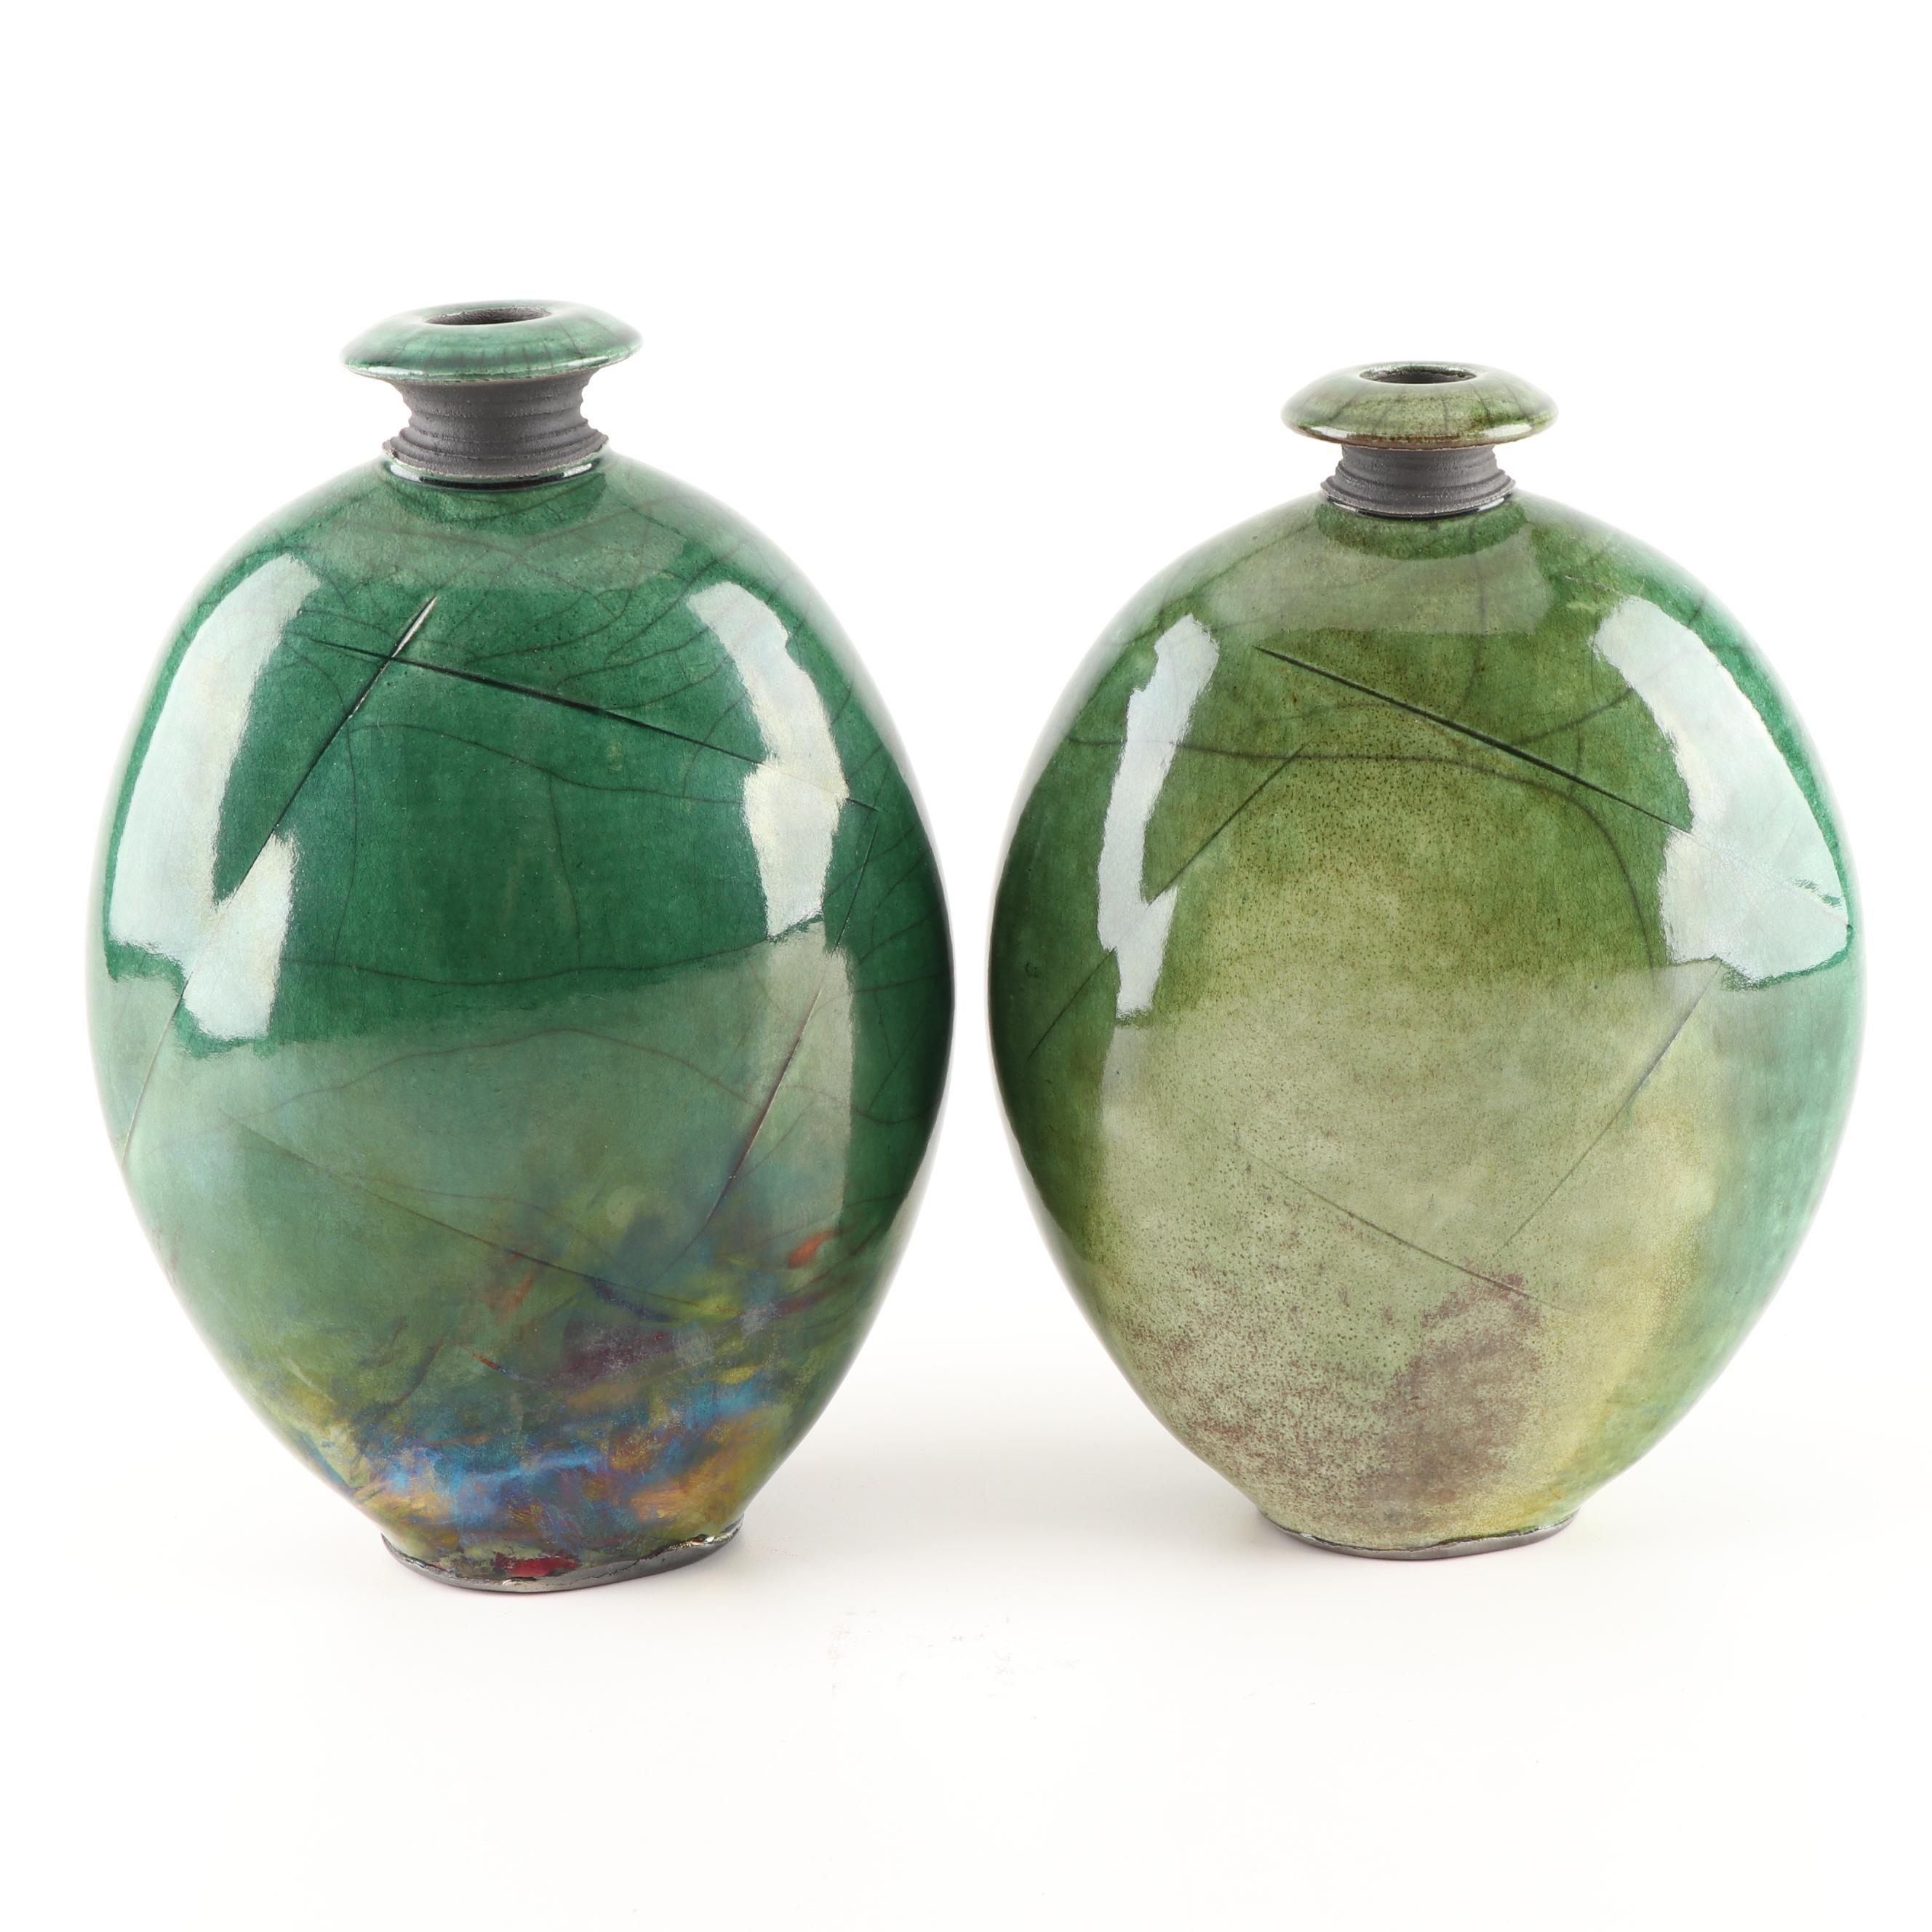 "Joe Winter ""Flounder"" Green Raku Pottery Vases"